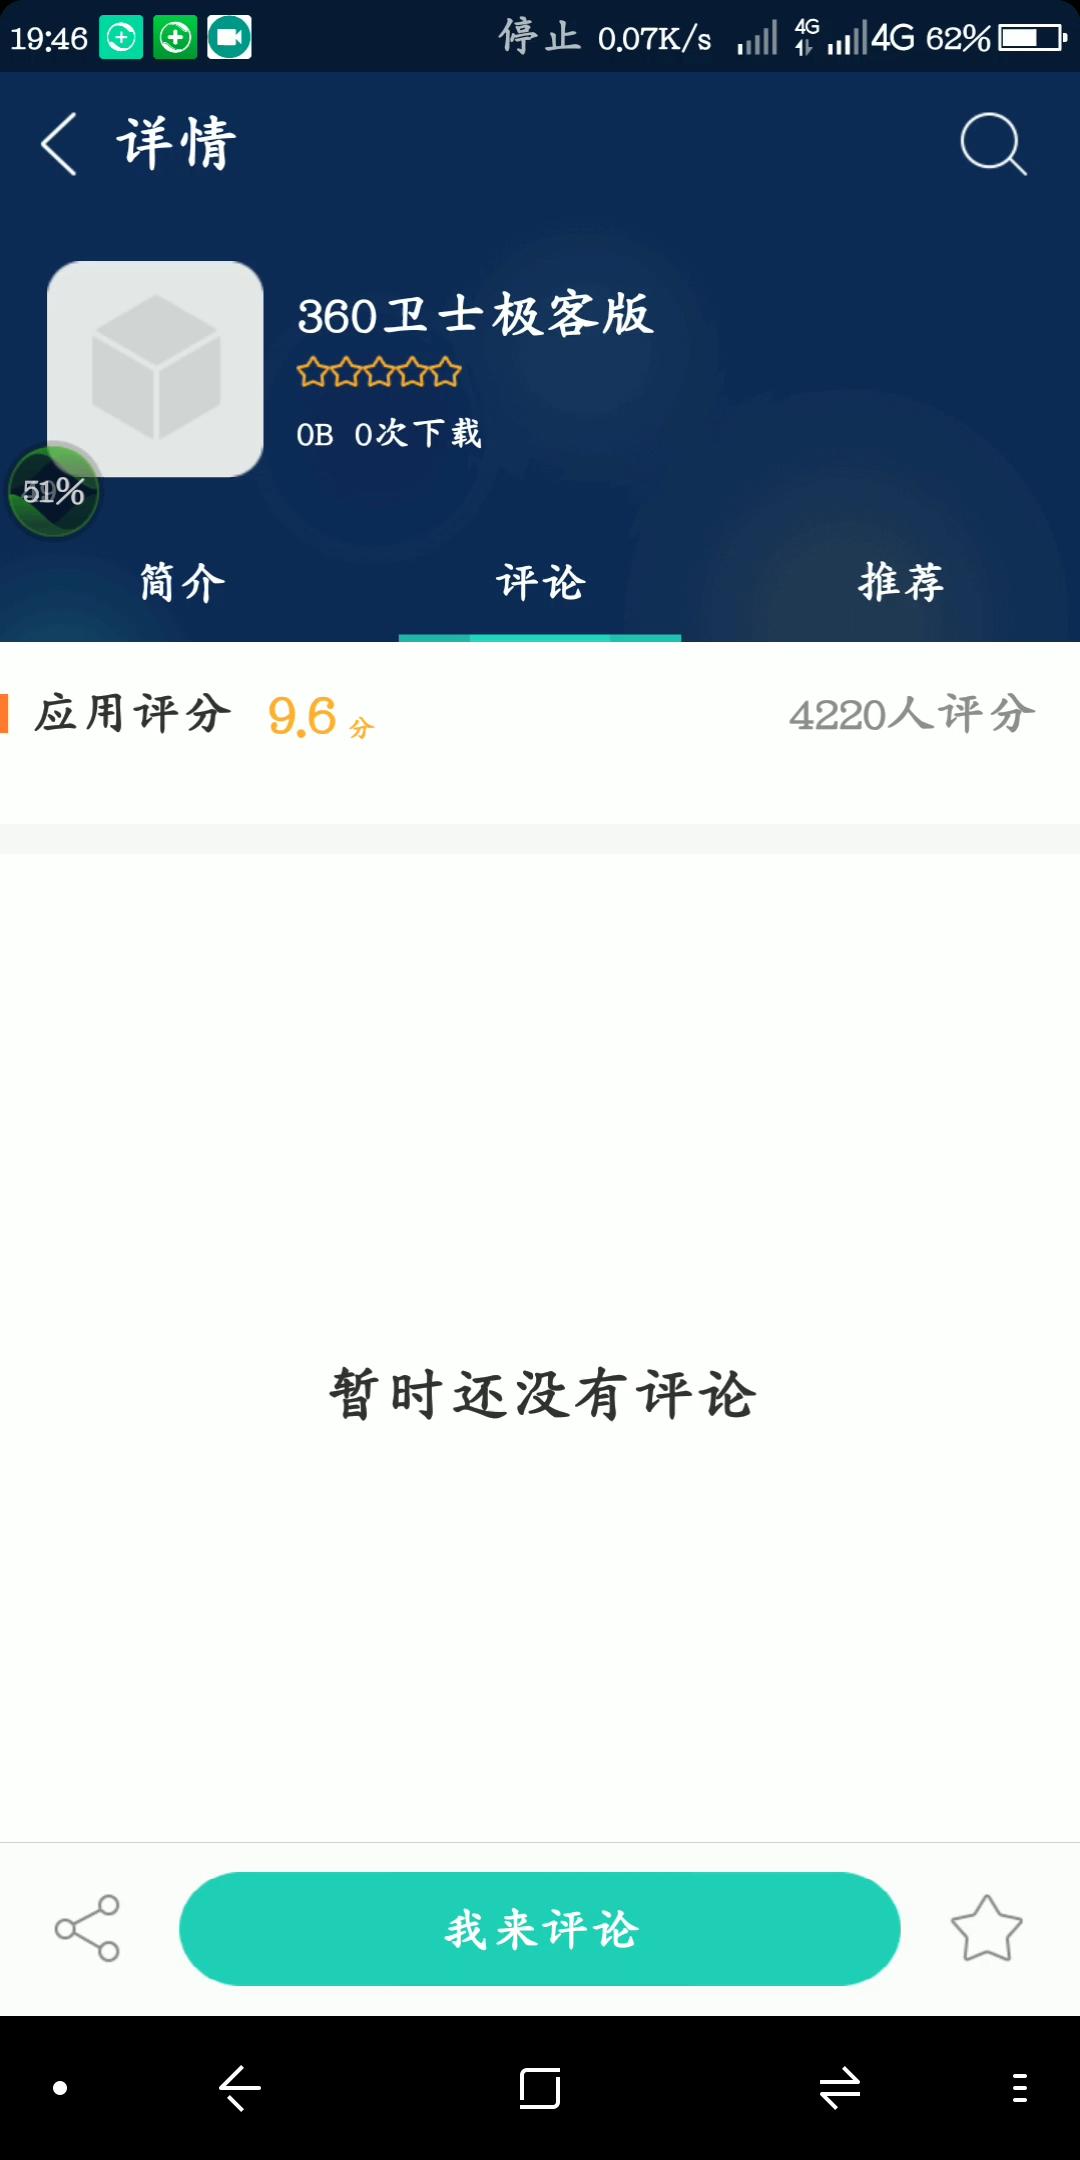 Screenshot_2018-06-28-19-53-41.png